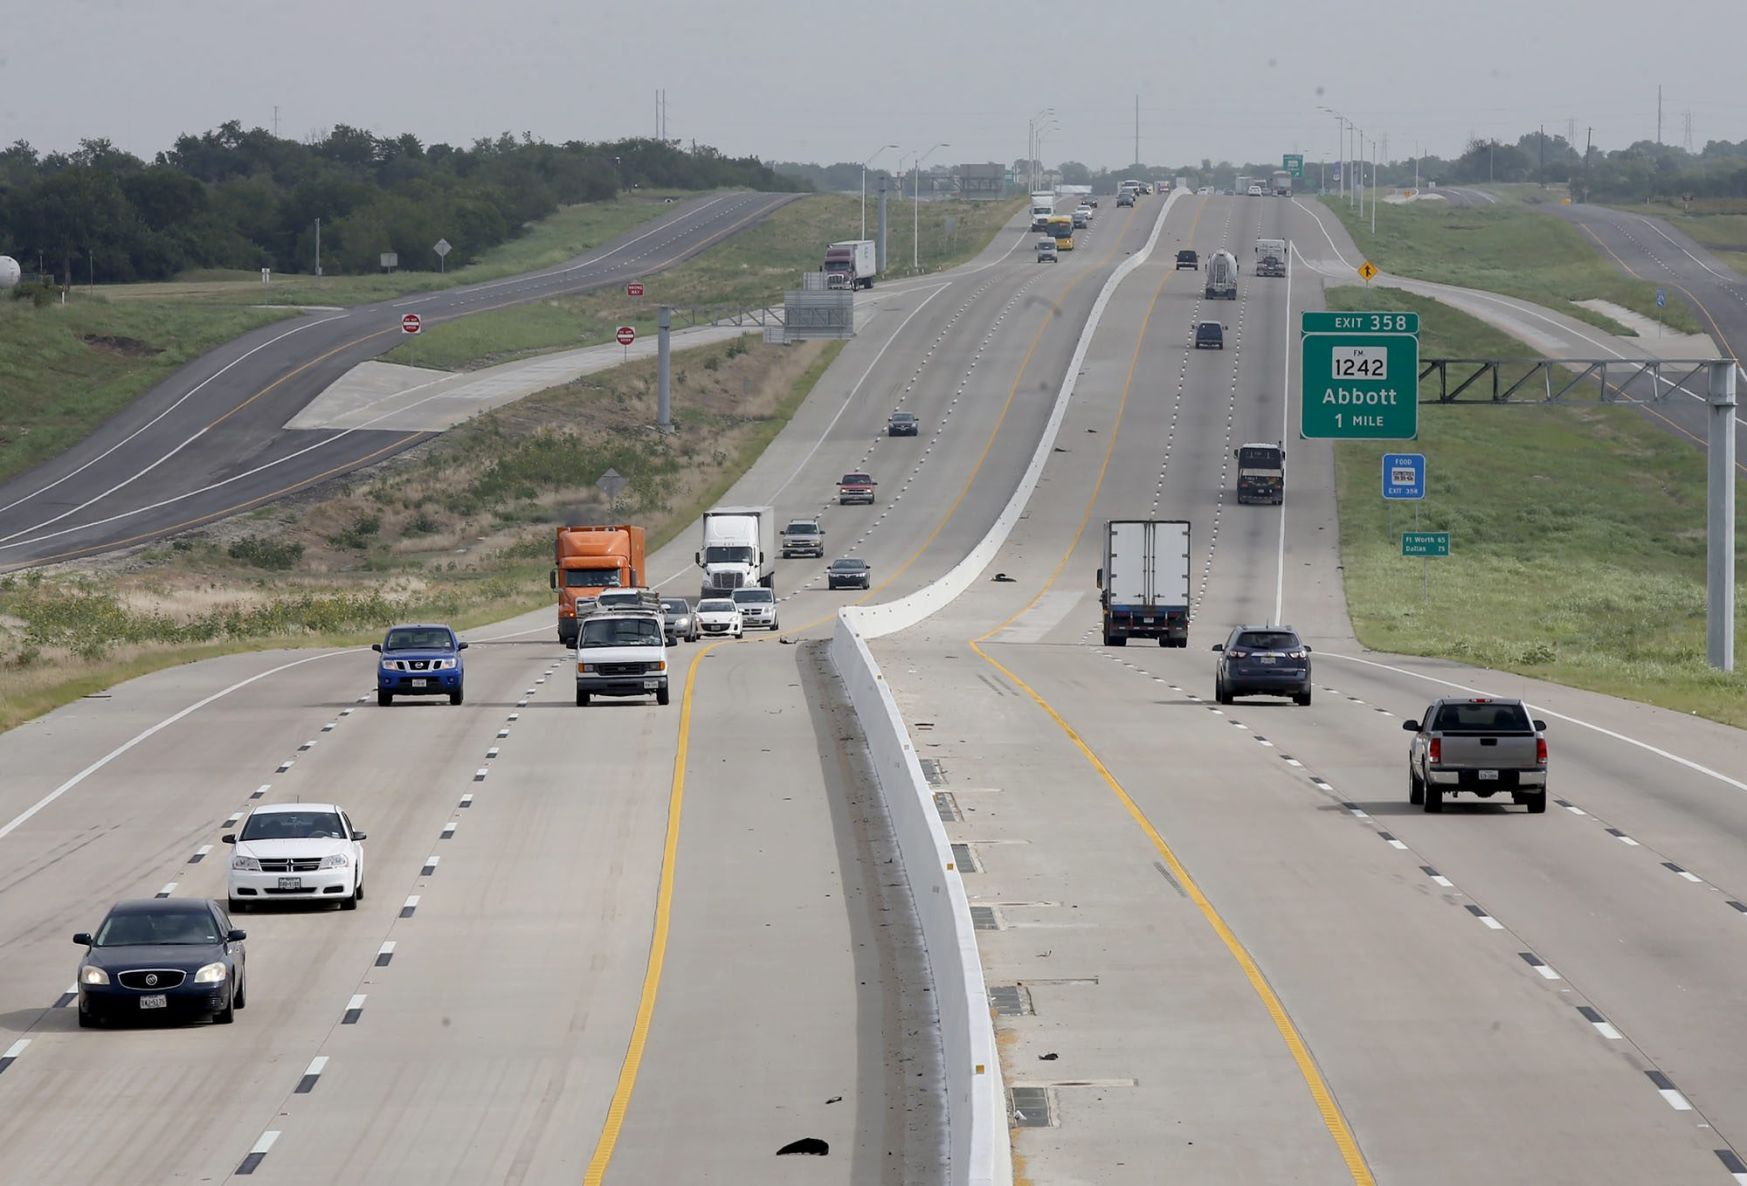 I 35 construction virtually complete north of Waco